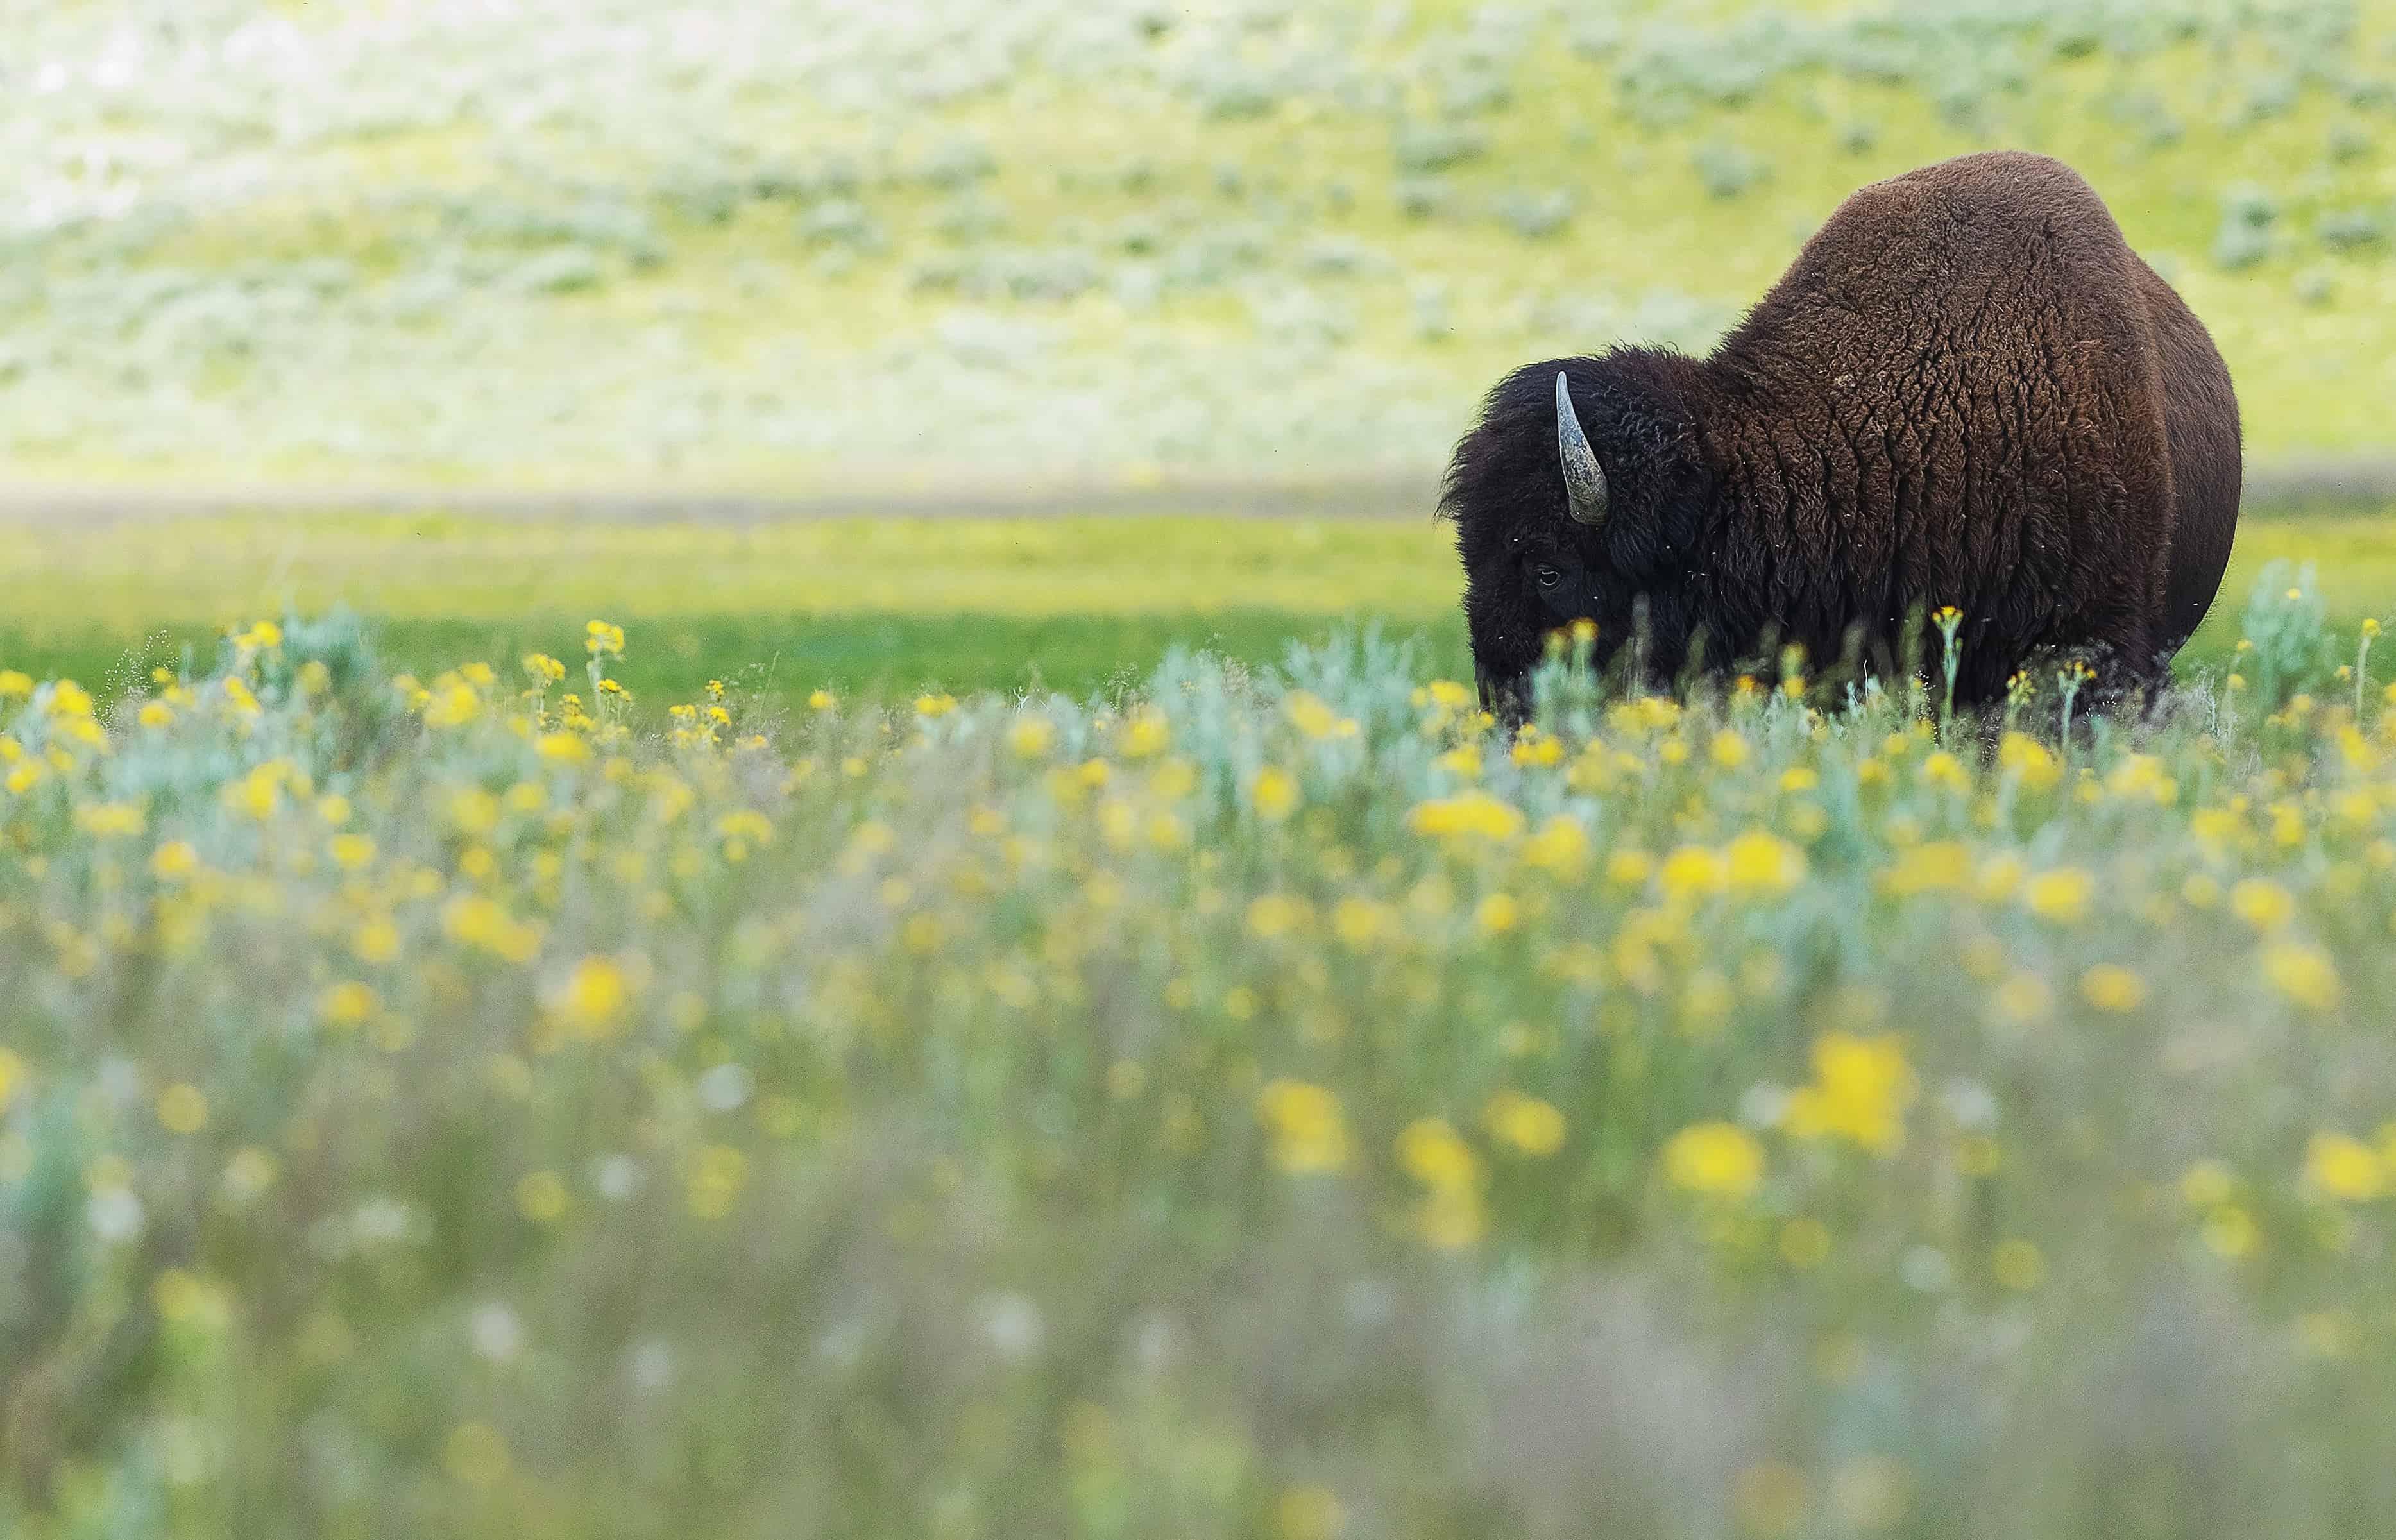 Buffalo grazing in tall grass amoungst yellow flowers.